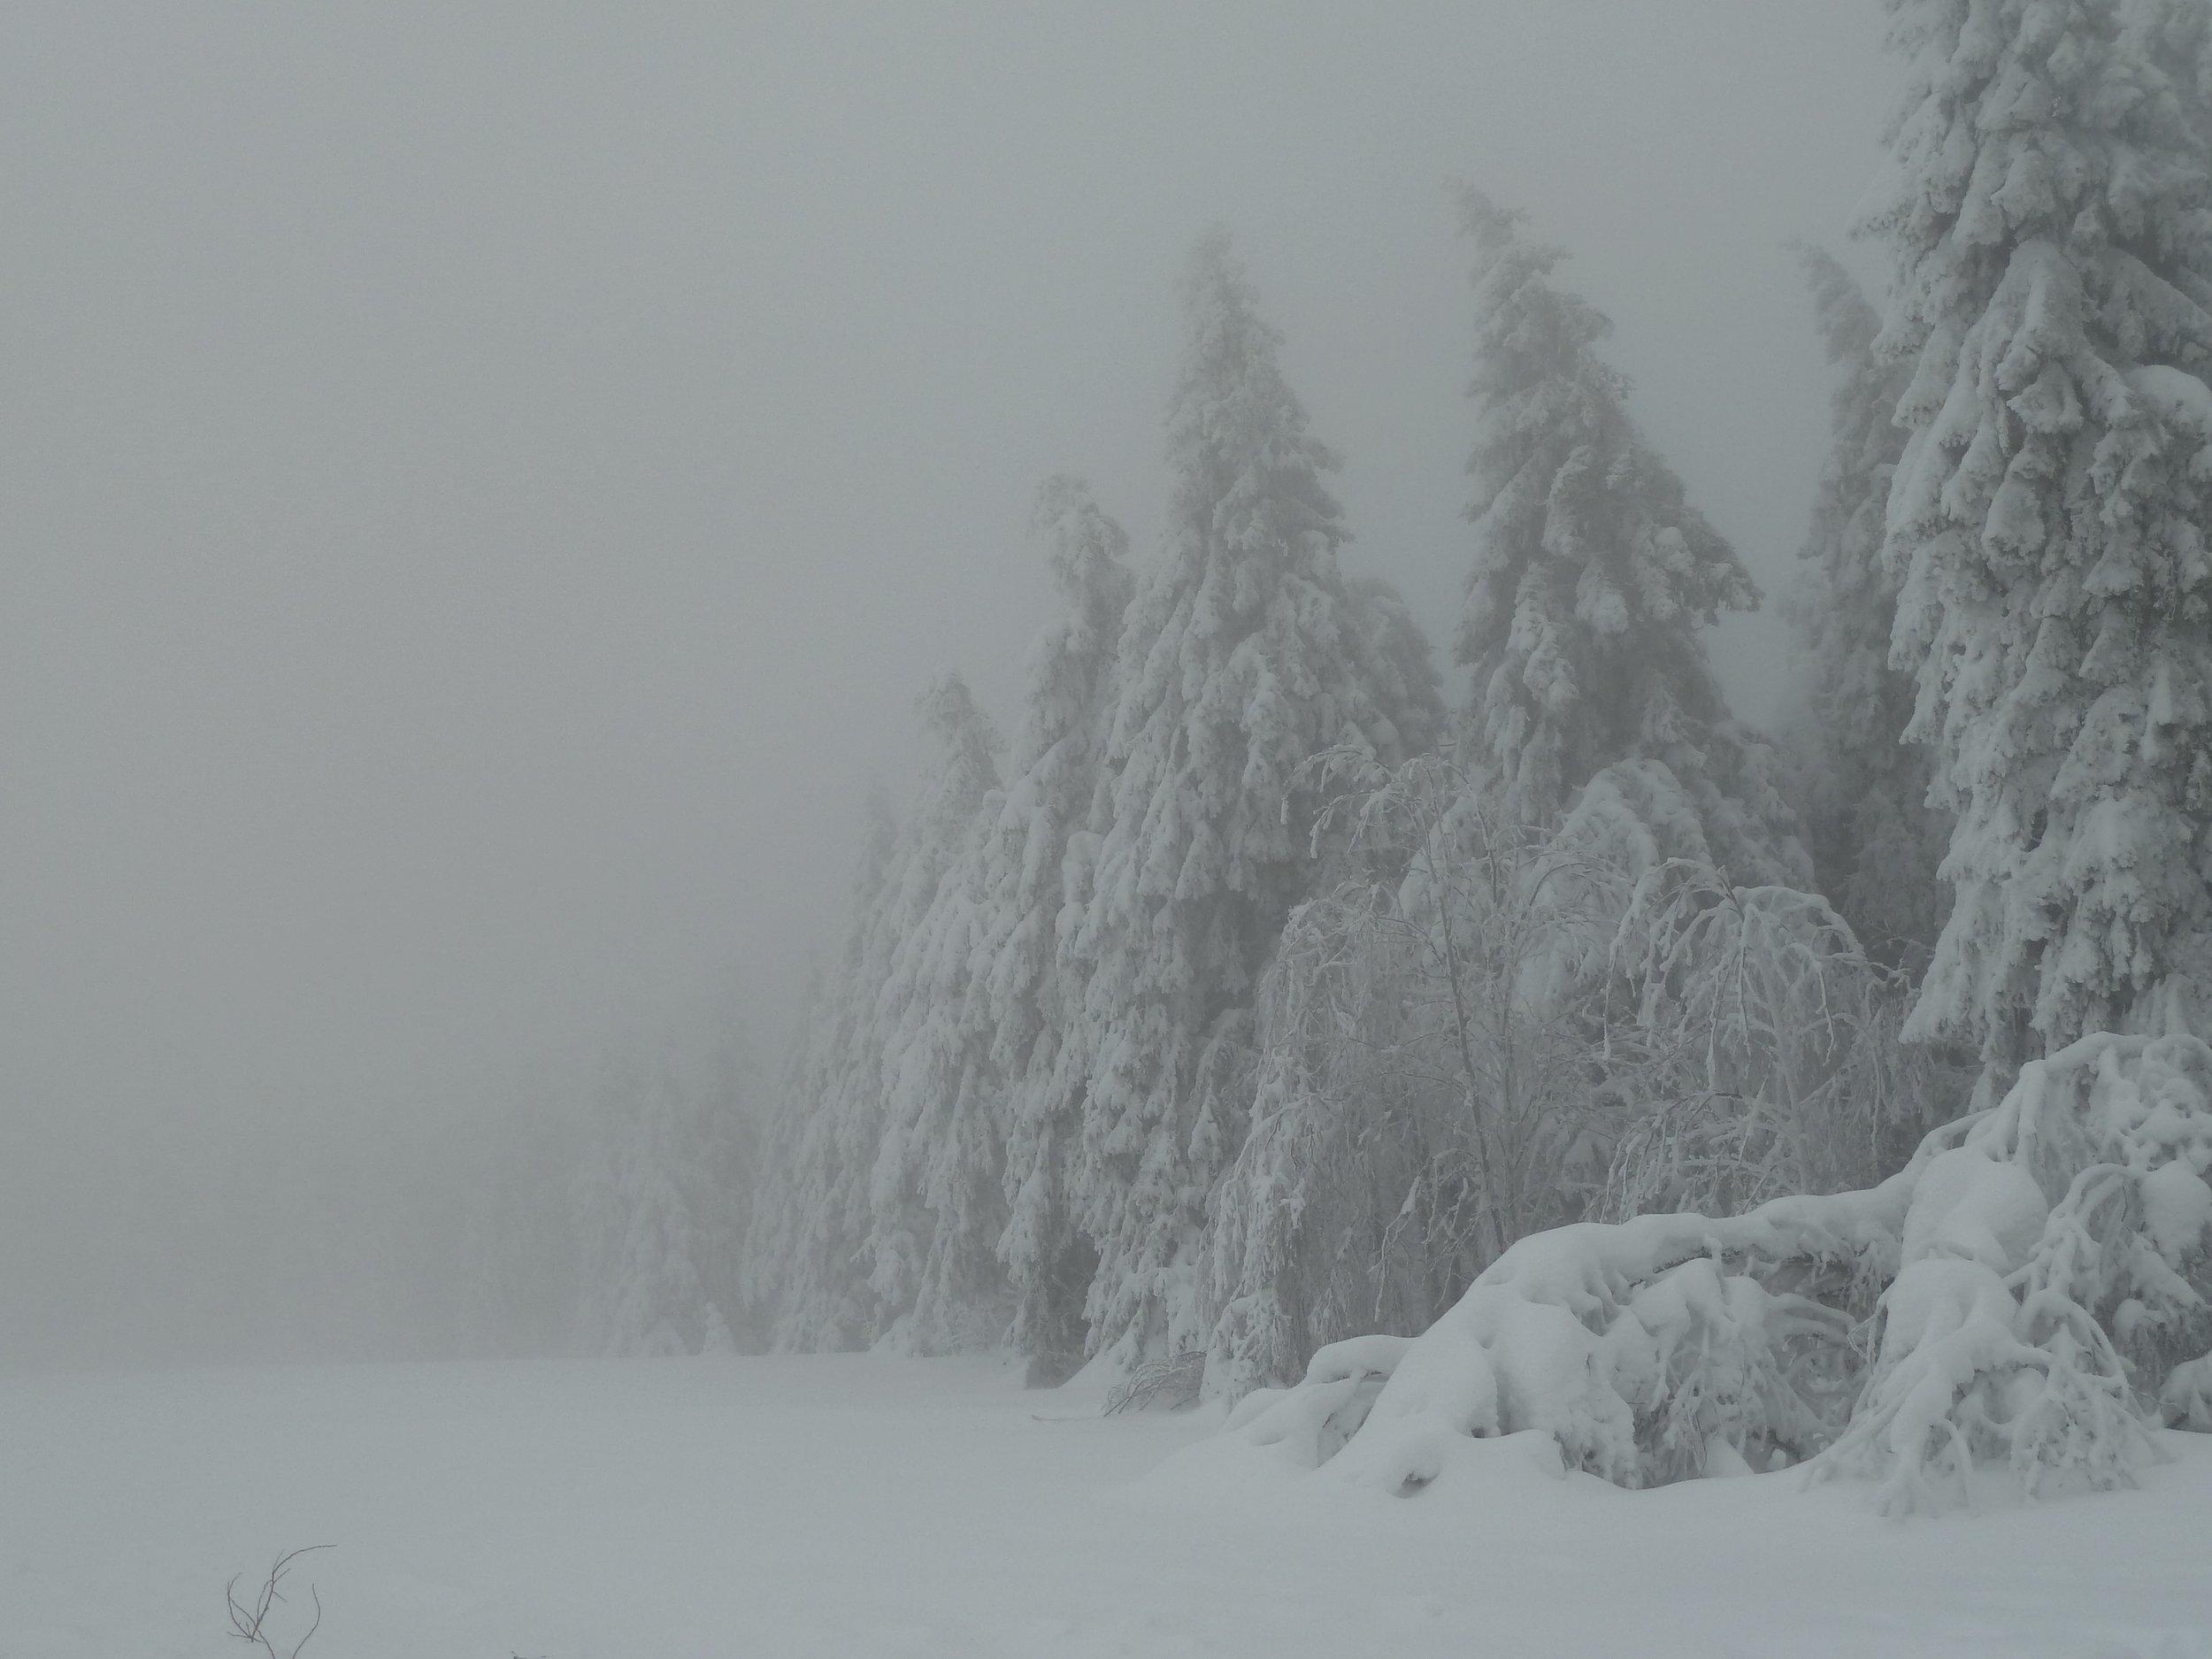 Harz Mountain Winter, 2012